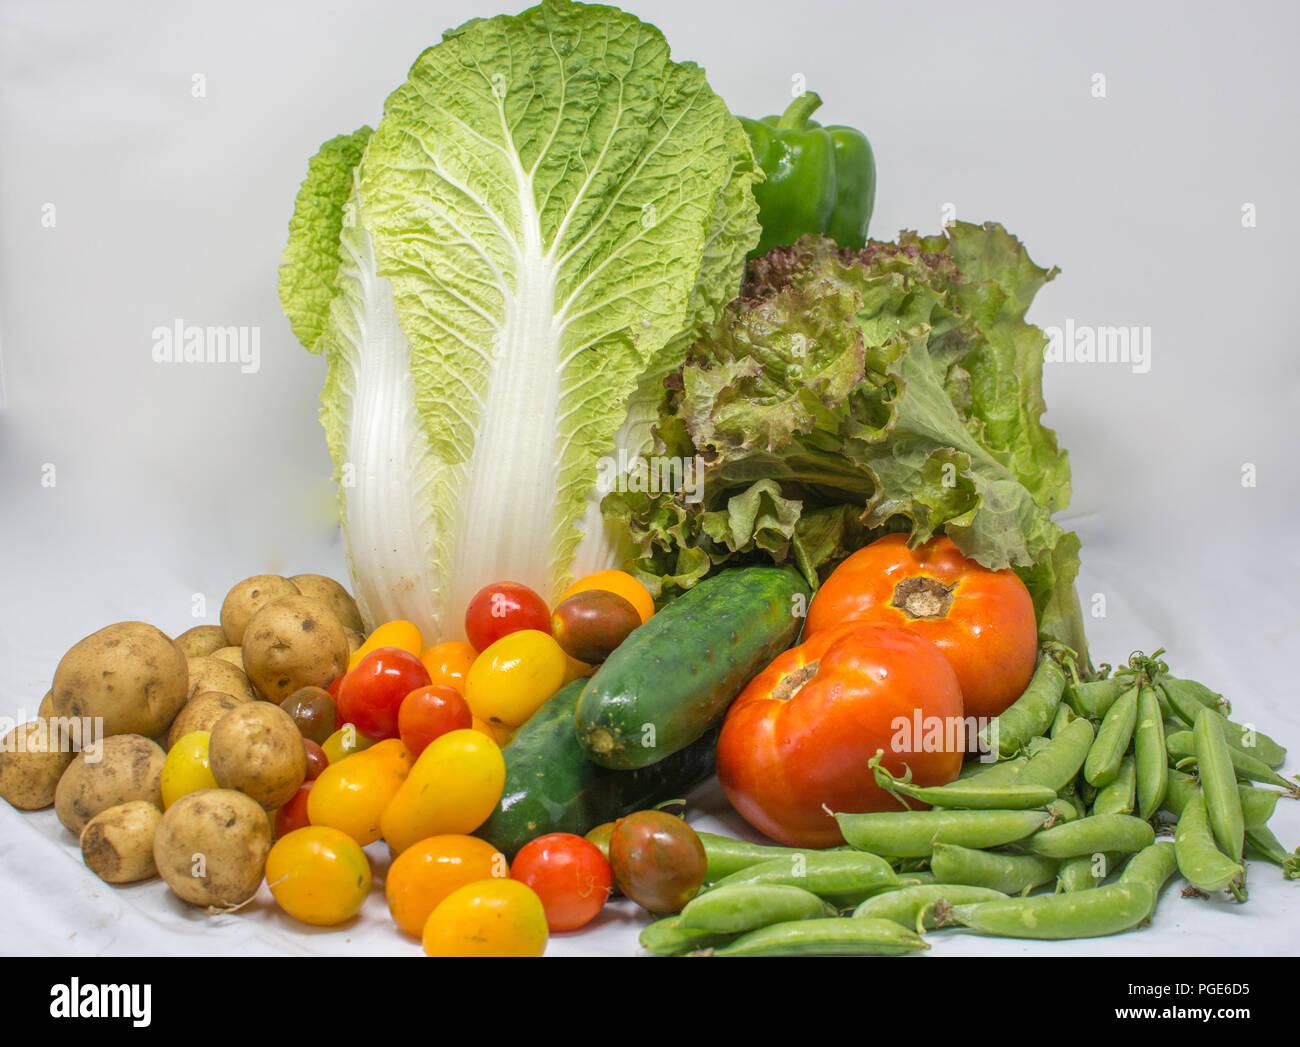 Organic Veggies Basket from Family Farmers - Stock Image